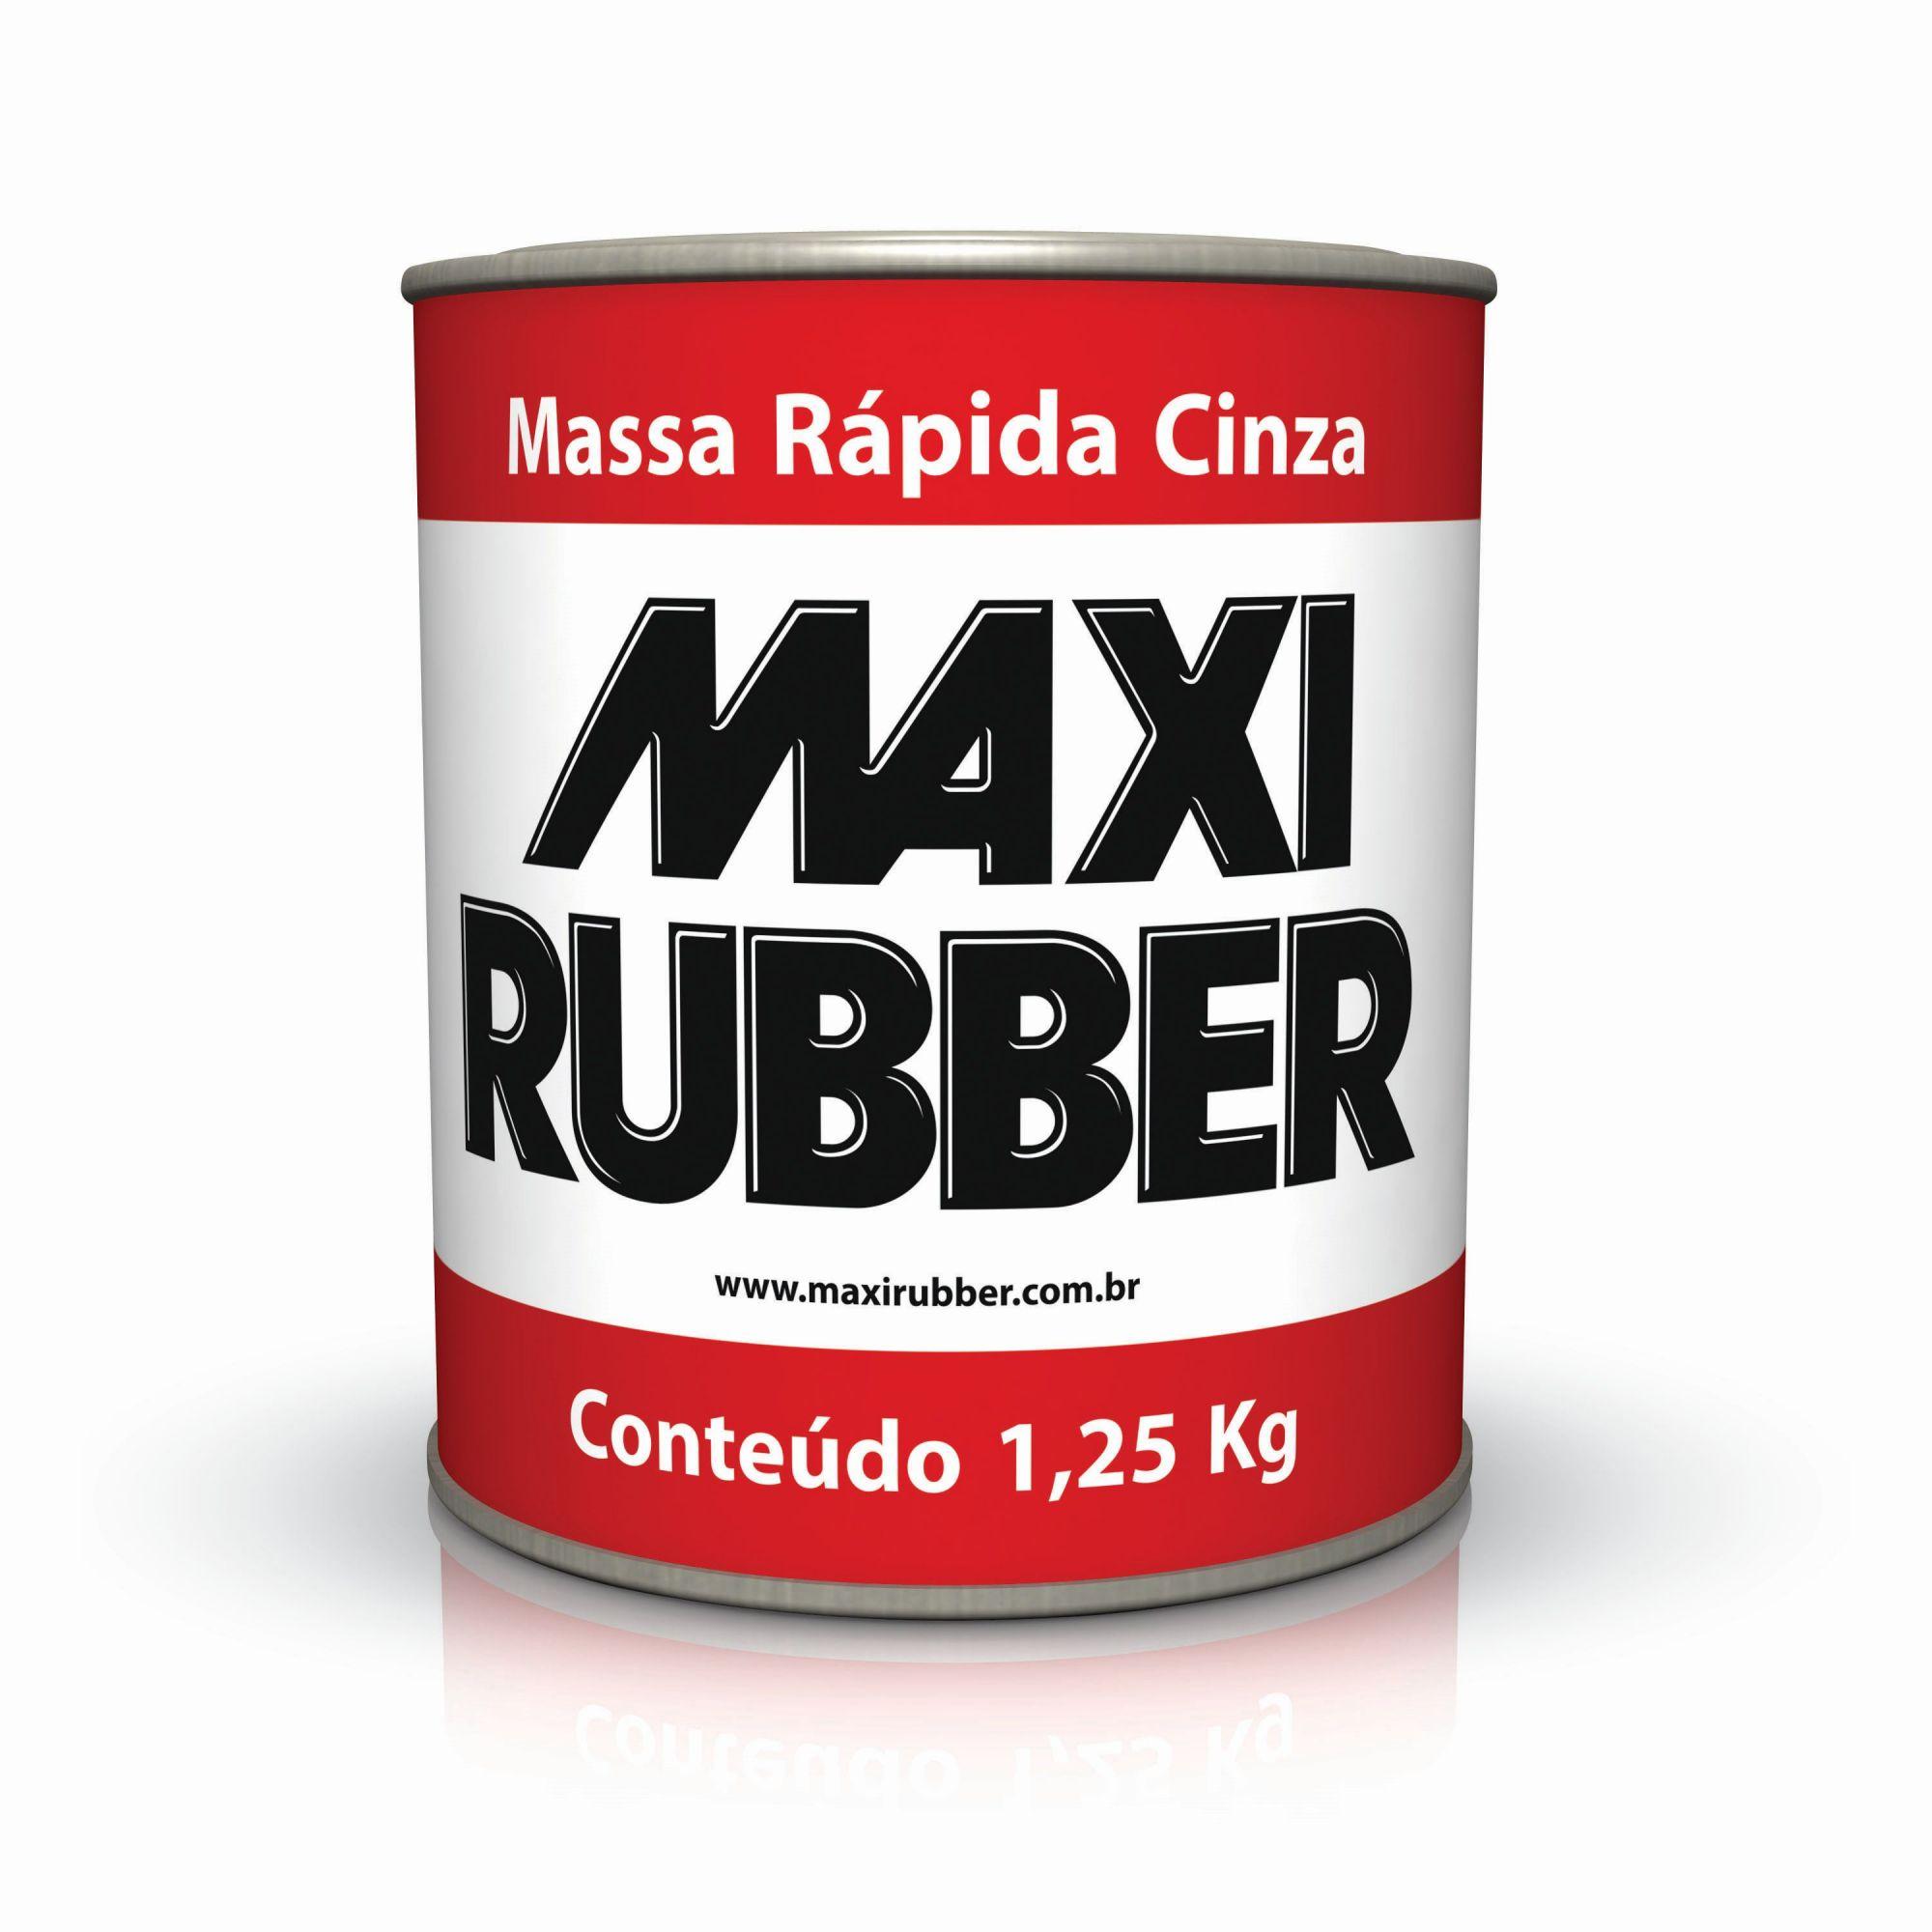 Massa Rápida Cinza 1.25kg - Maxi Rubber